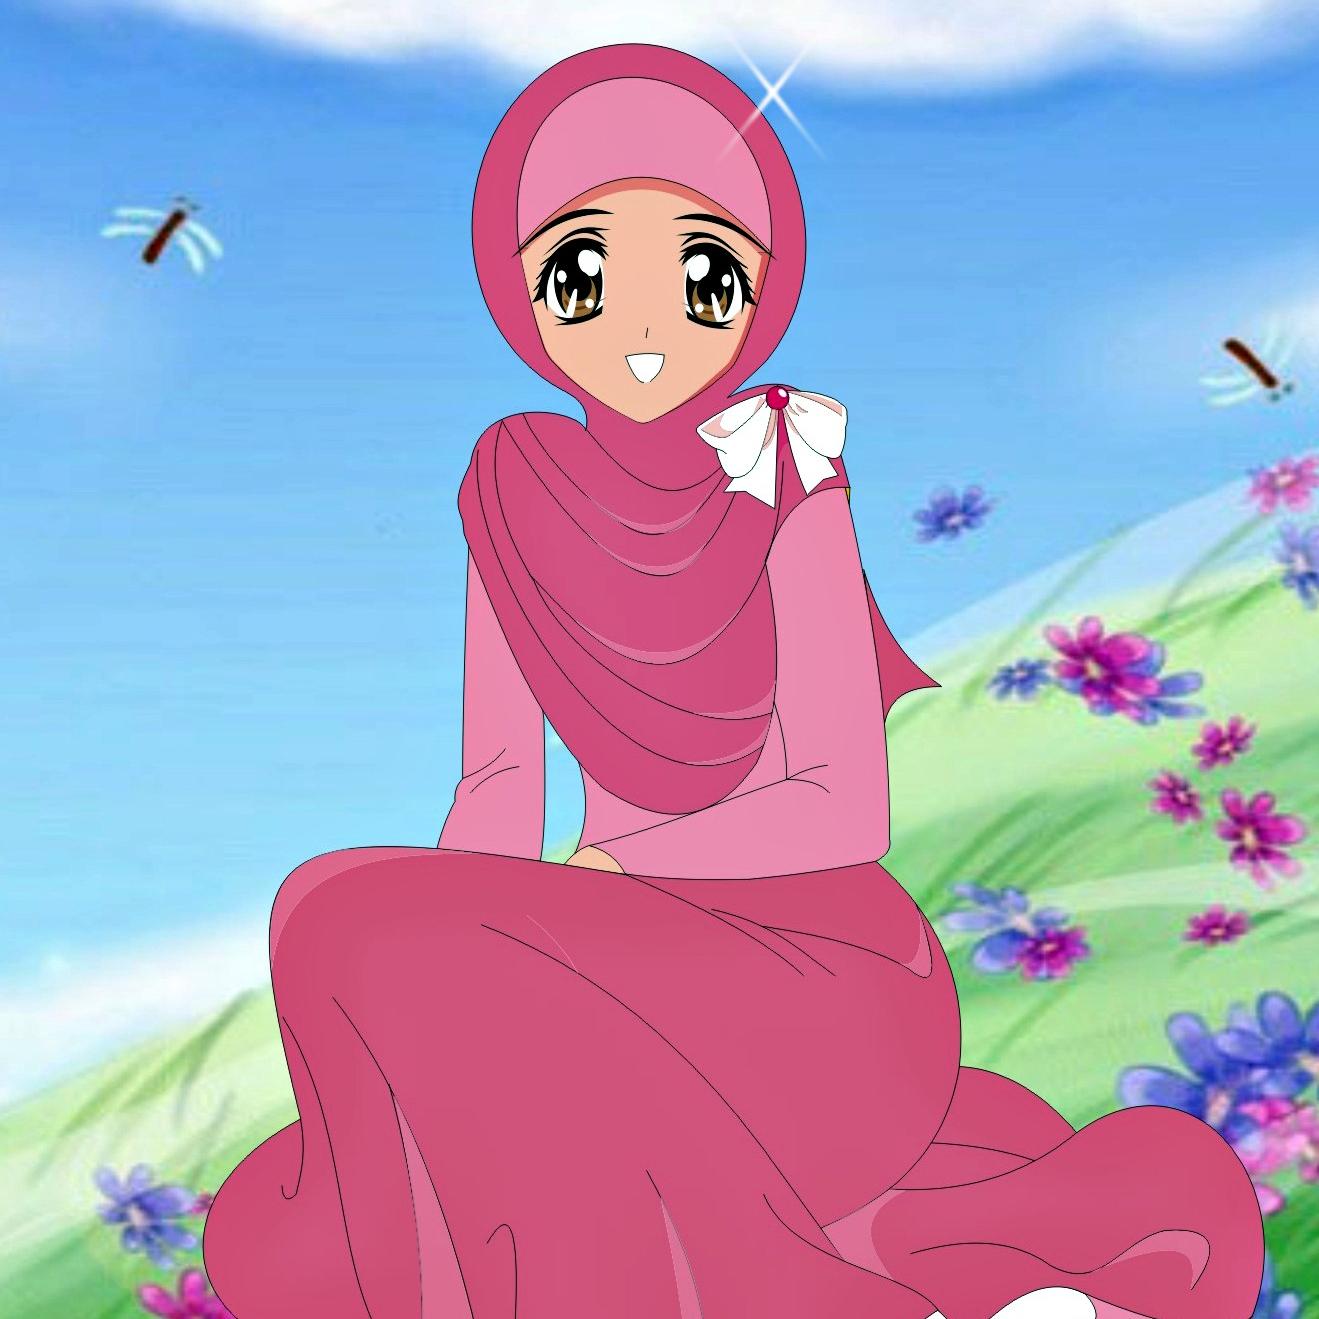 Animasi Gambar Kartun Muslimah Lucu Cantik Dan Imut